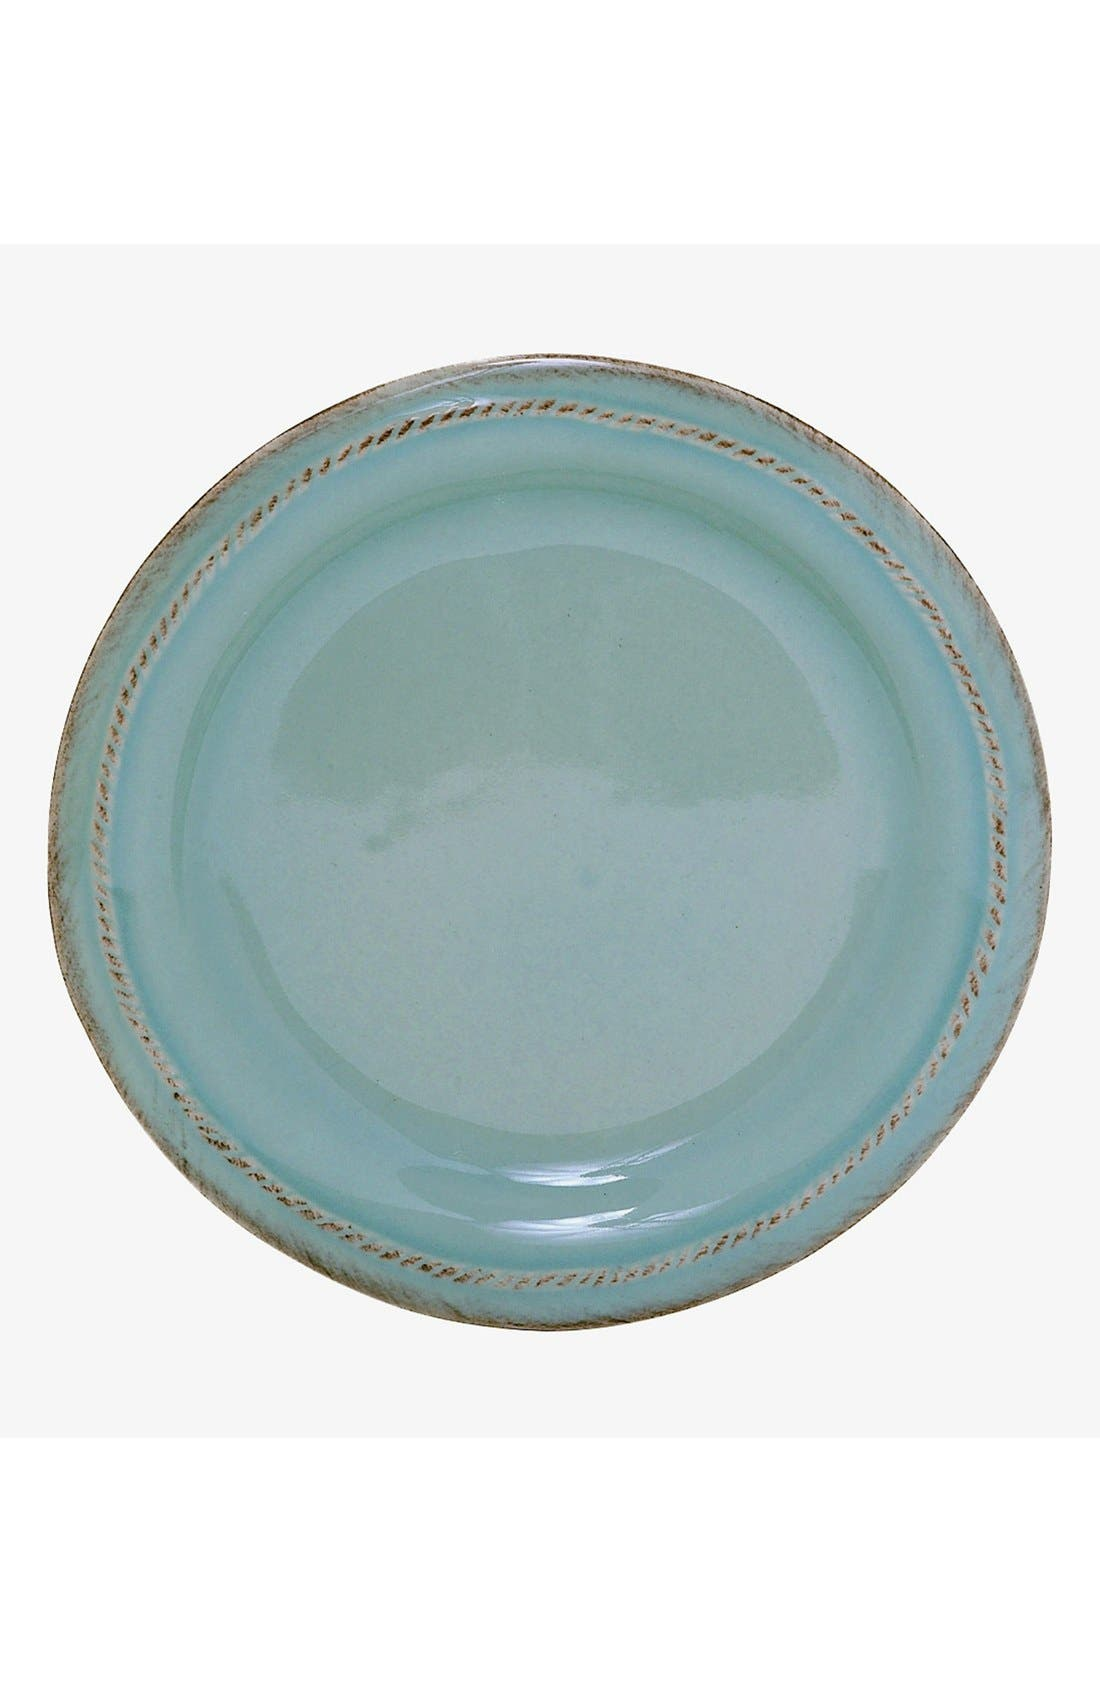 Main Image - Juliska'Berry and Thread' Side Plate